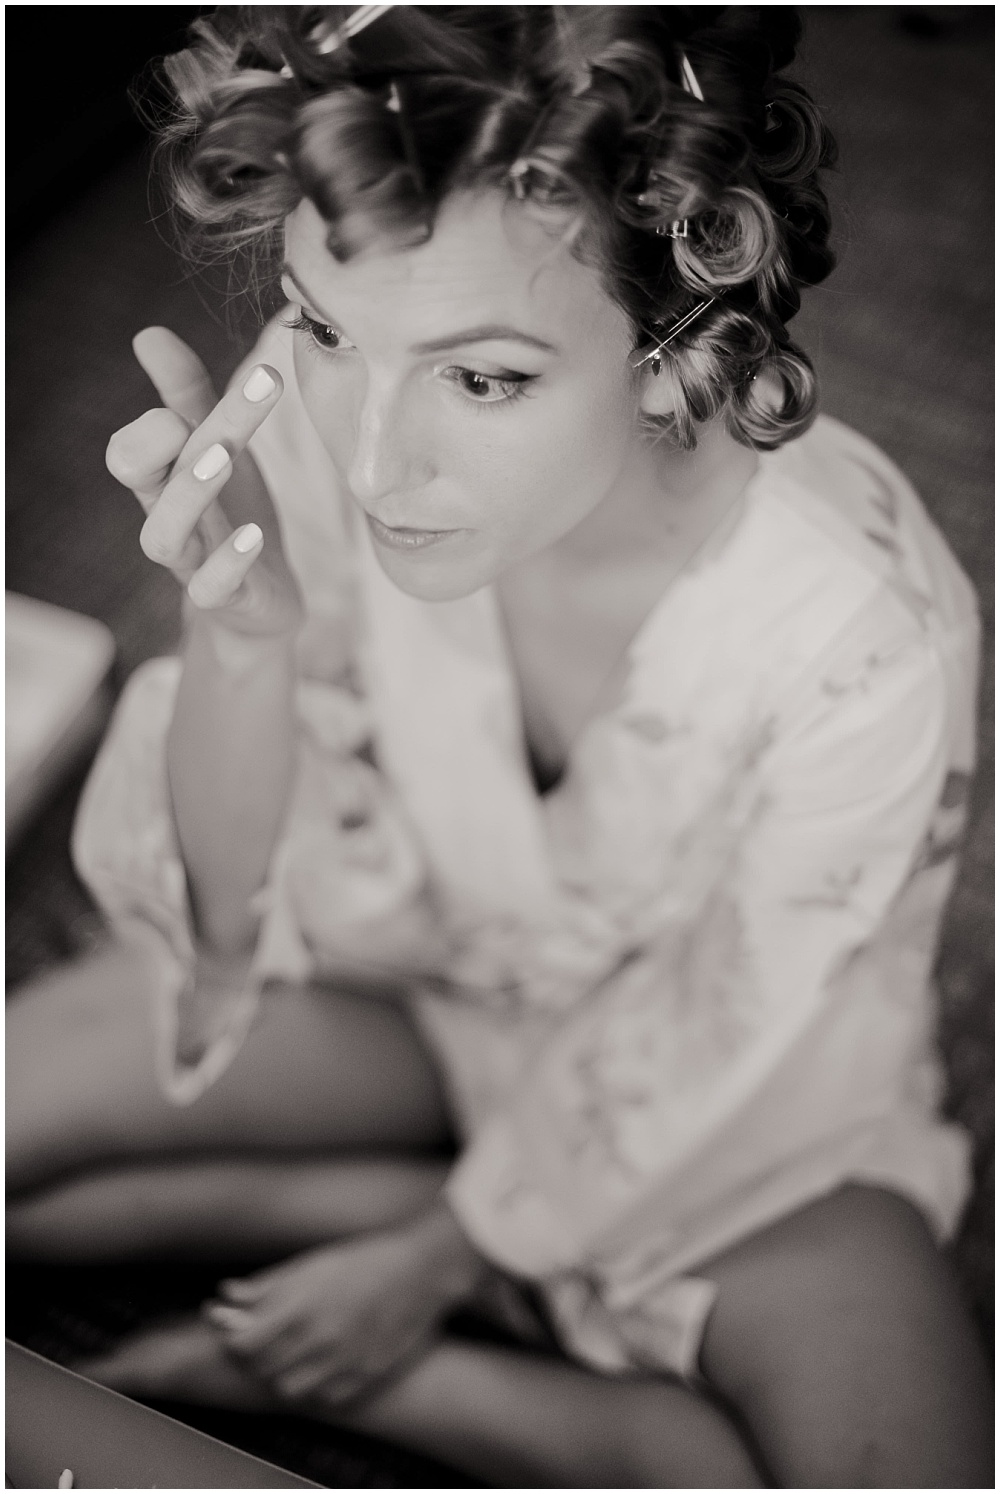 Bride getting ready in her robe | Mustard Seed Gardens Wedding by Sara Ackermann Photography & Jessica Dum Wedding Coordination